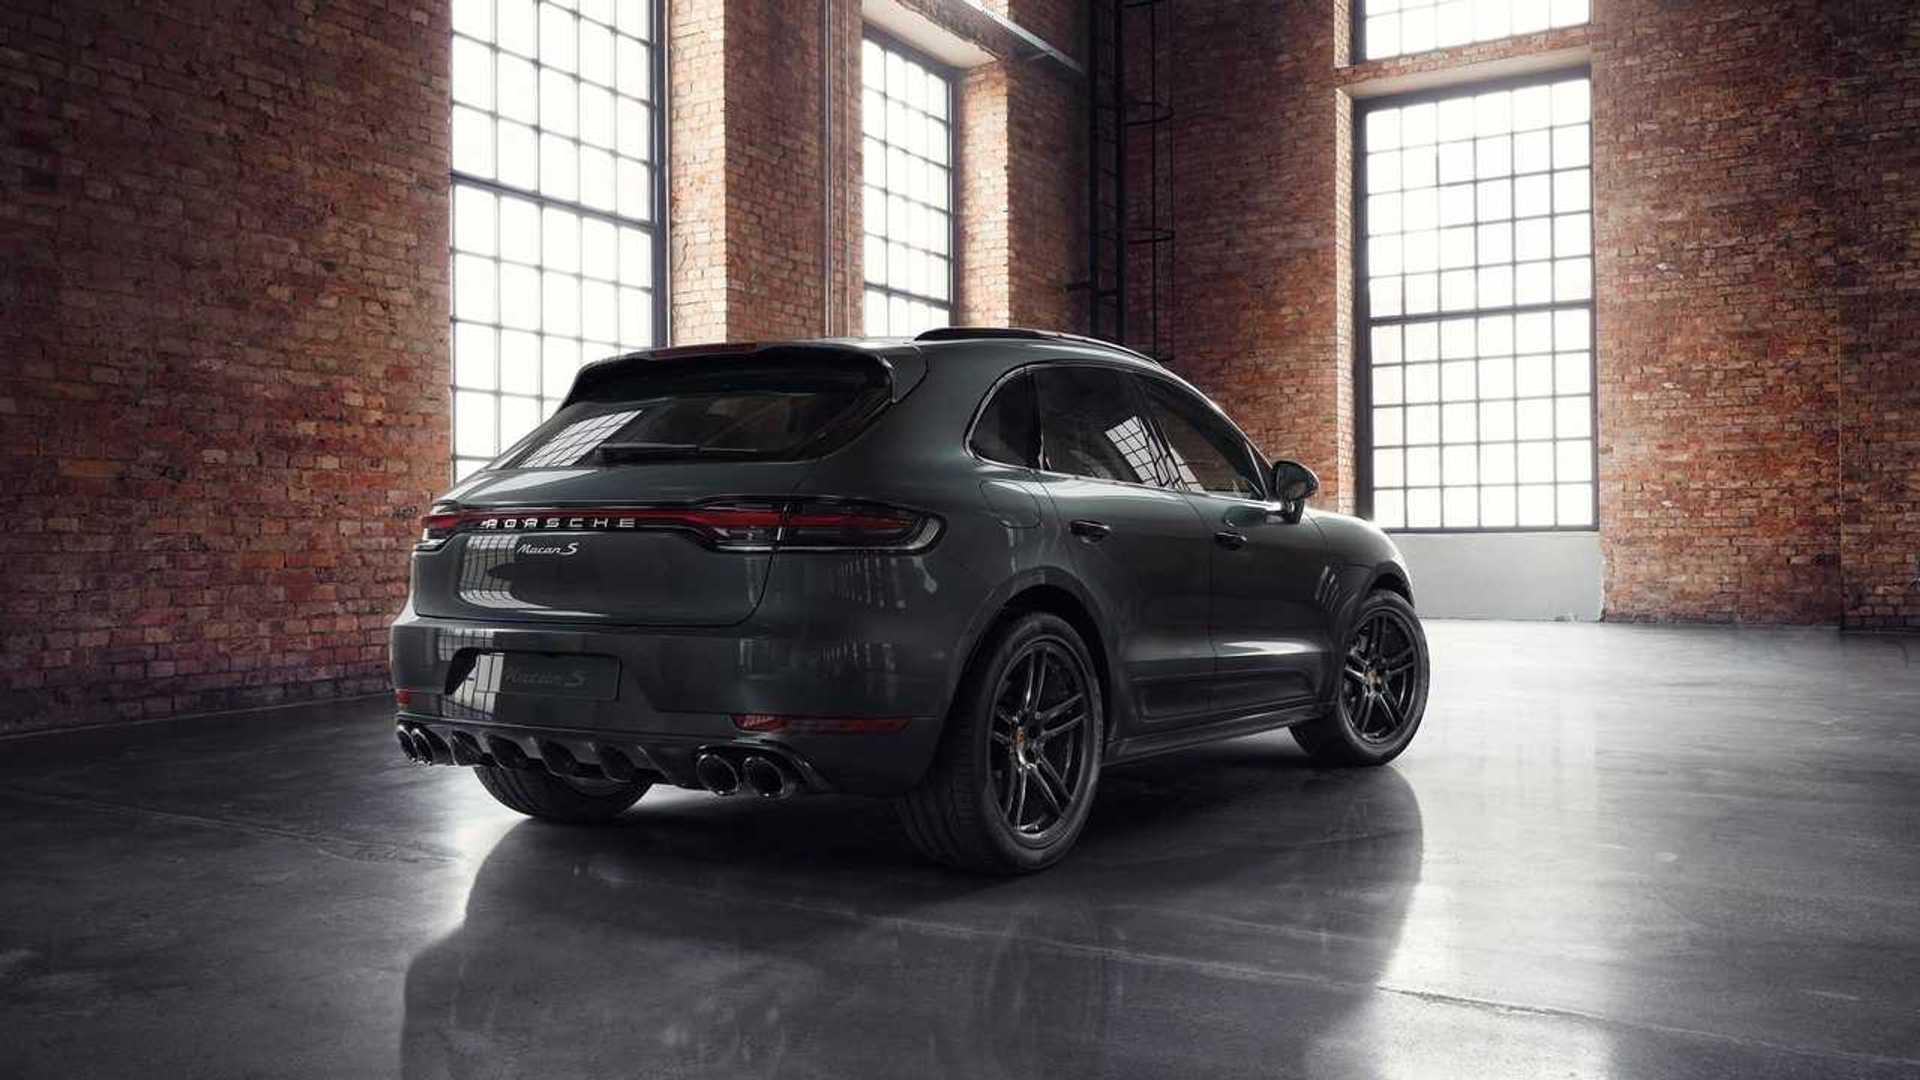 2019 Macan S Pampered By Porsche Exclusive Manufaktur